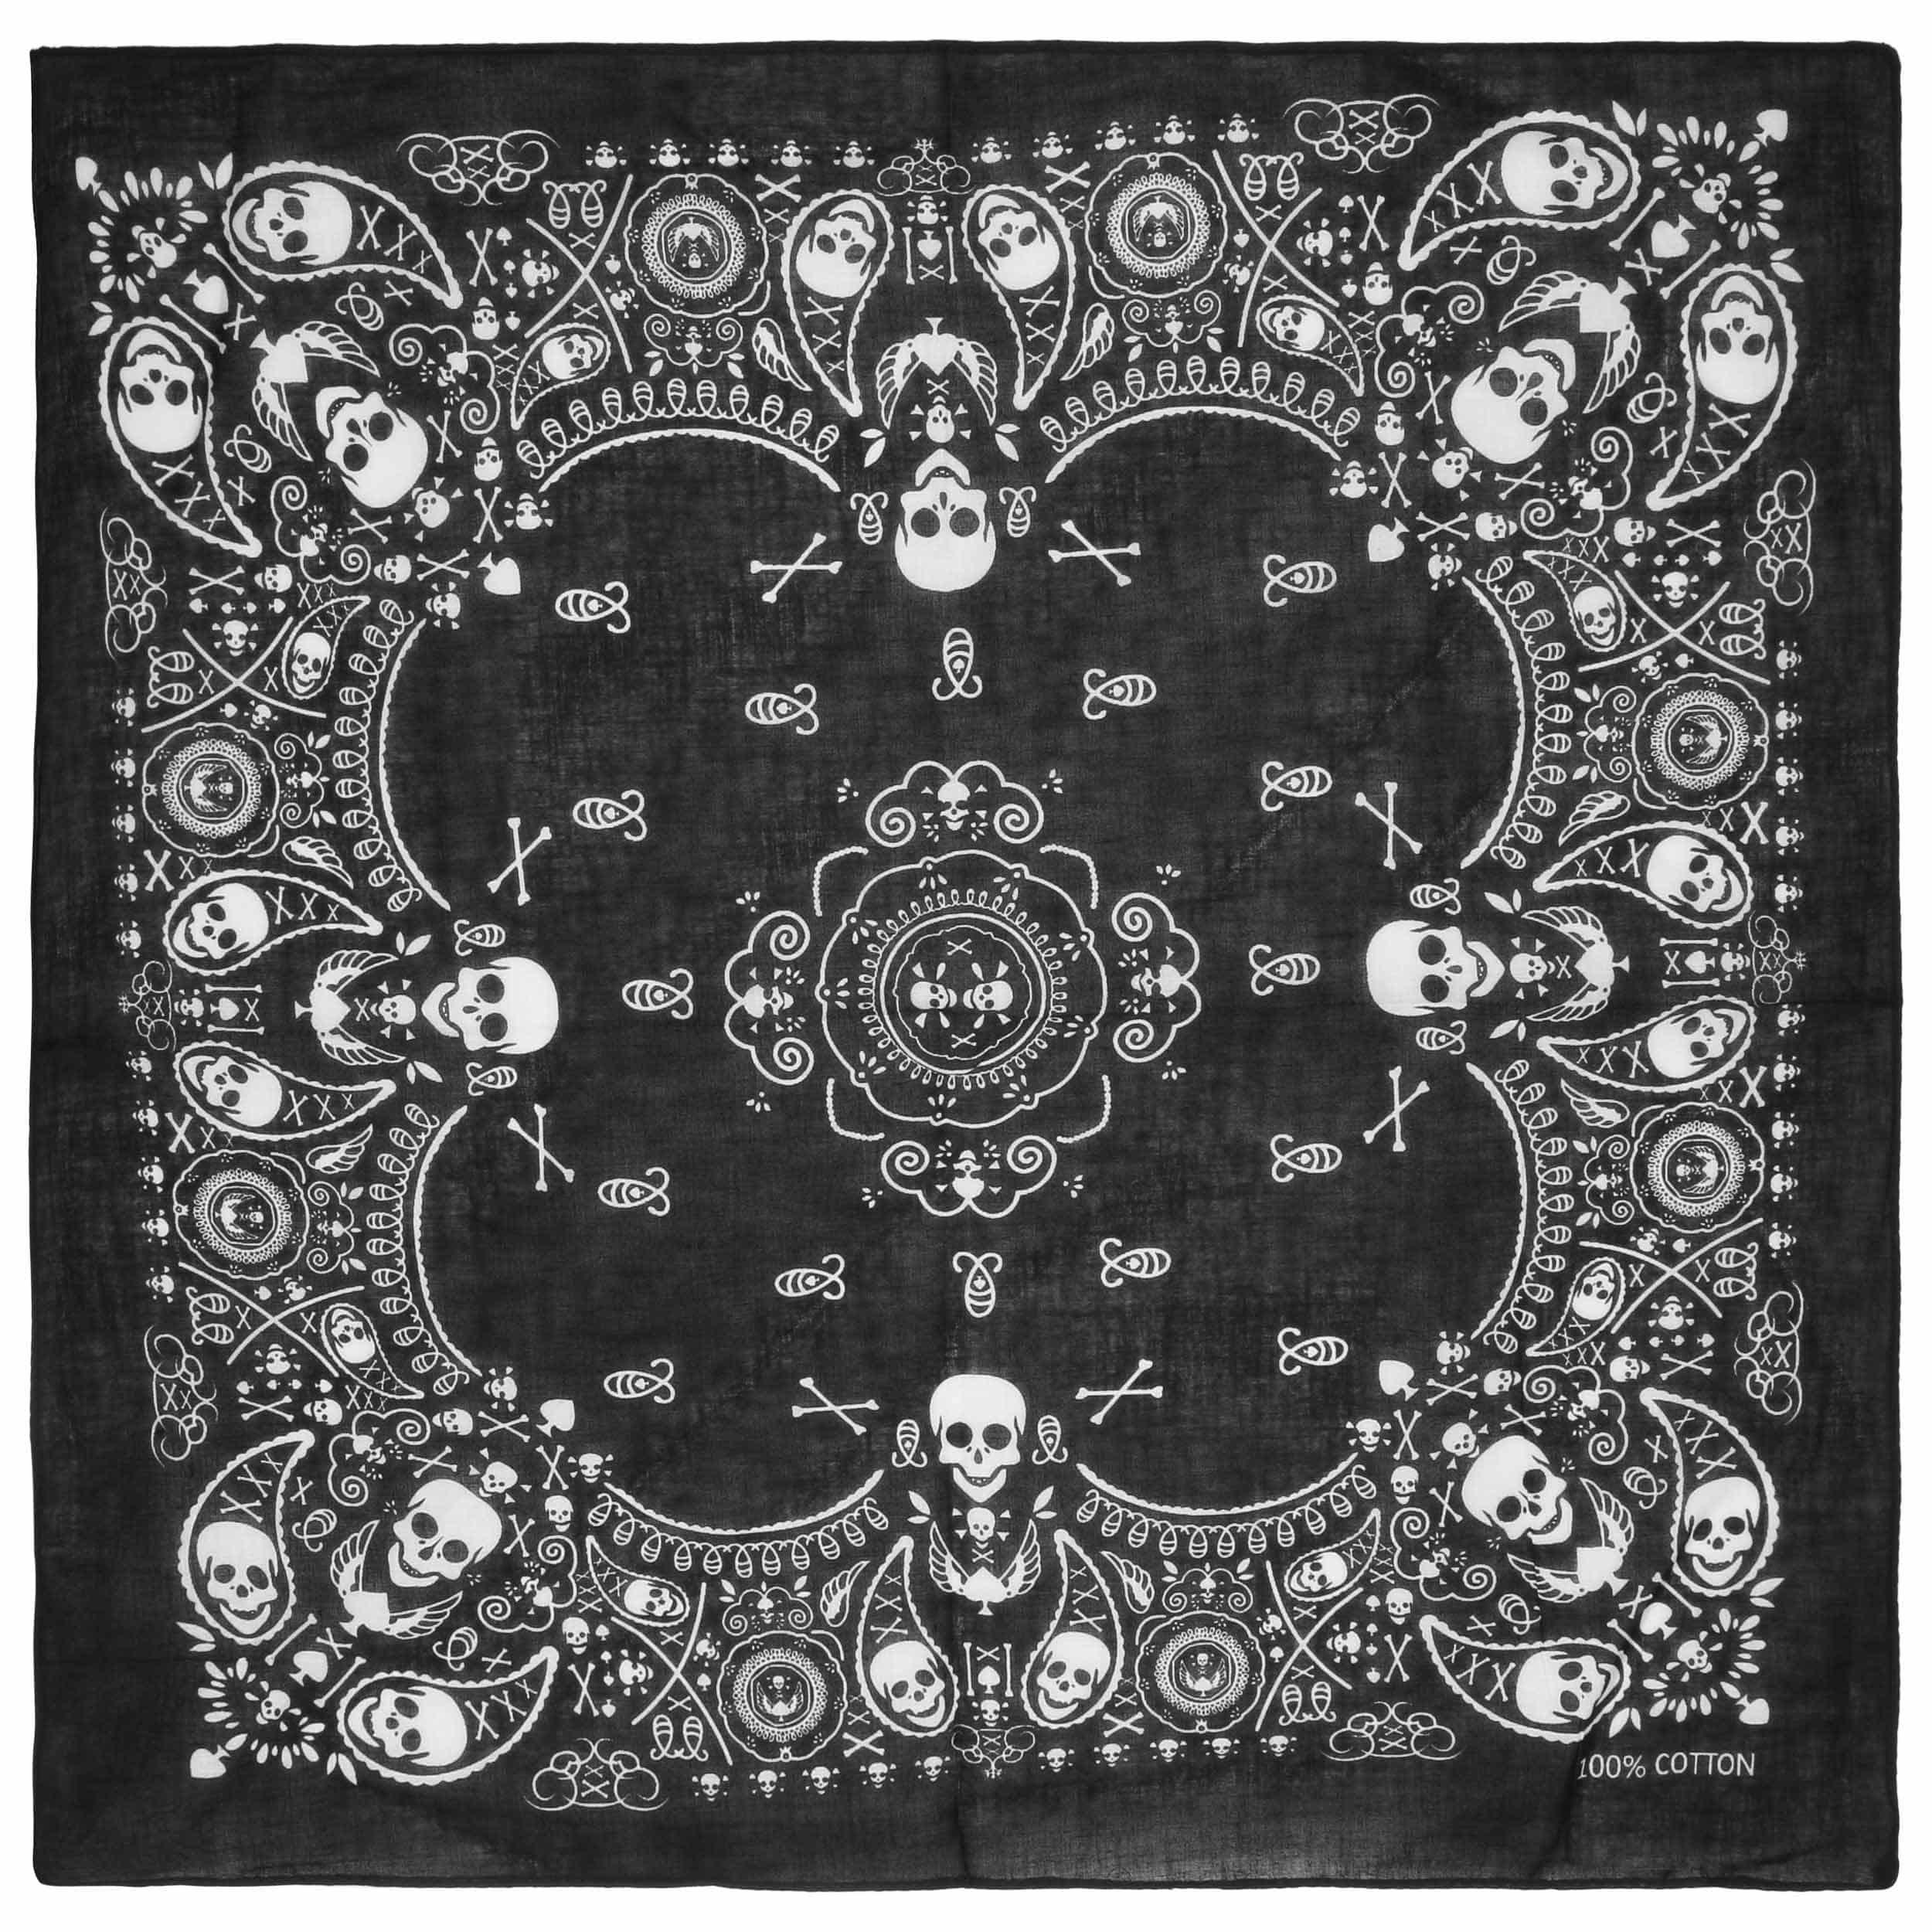 Skulls Cotton Bandana By Lipodo Gbp 2 95 Gt Hats Caps